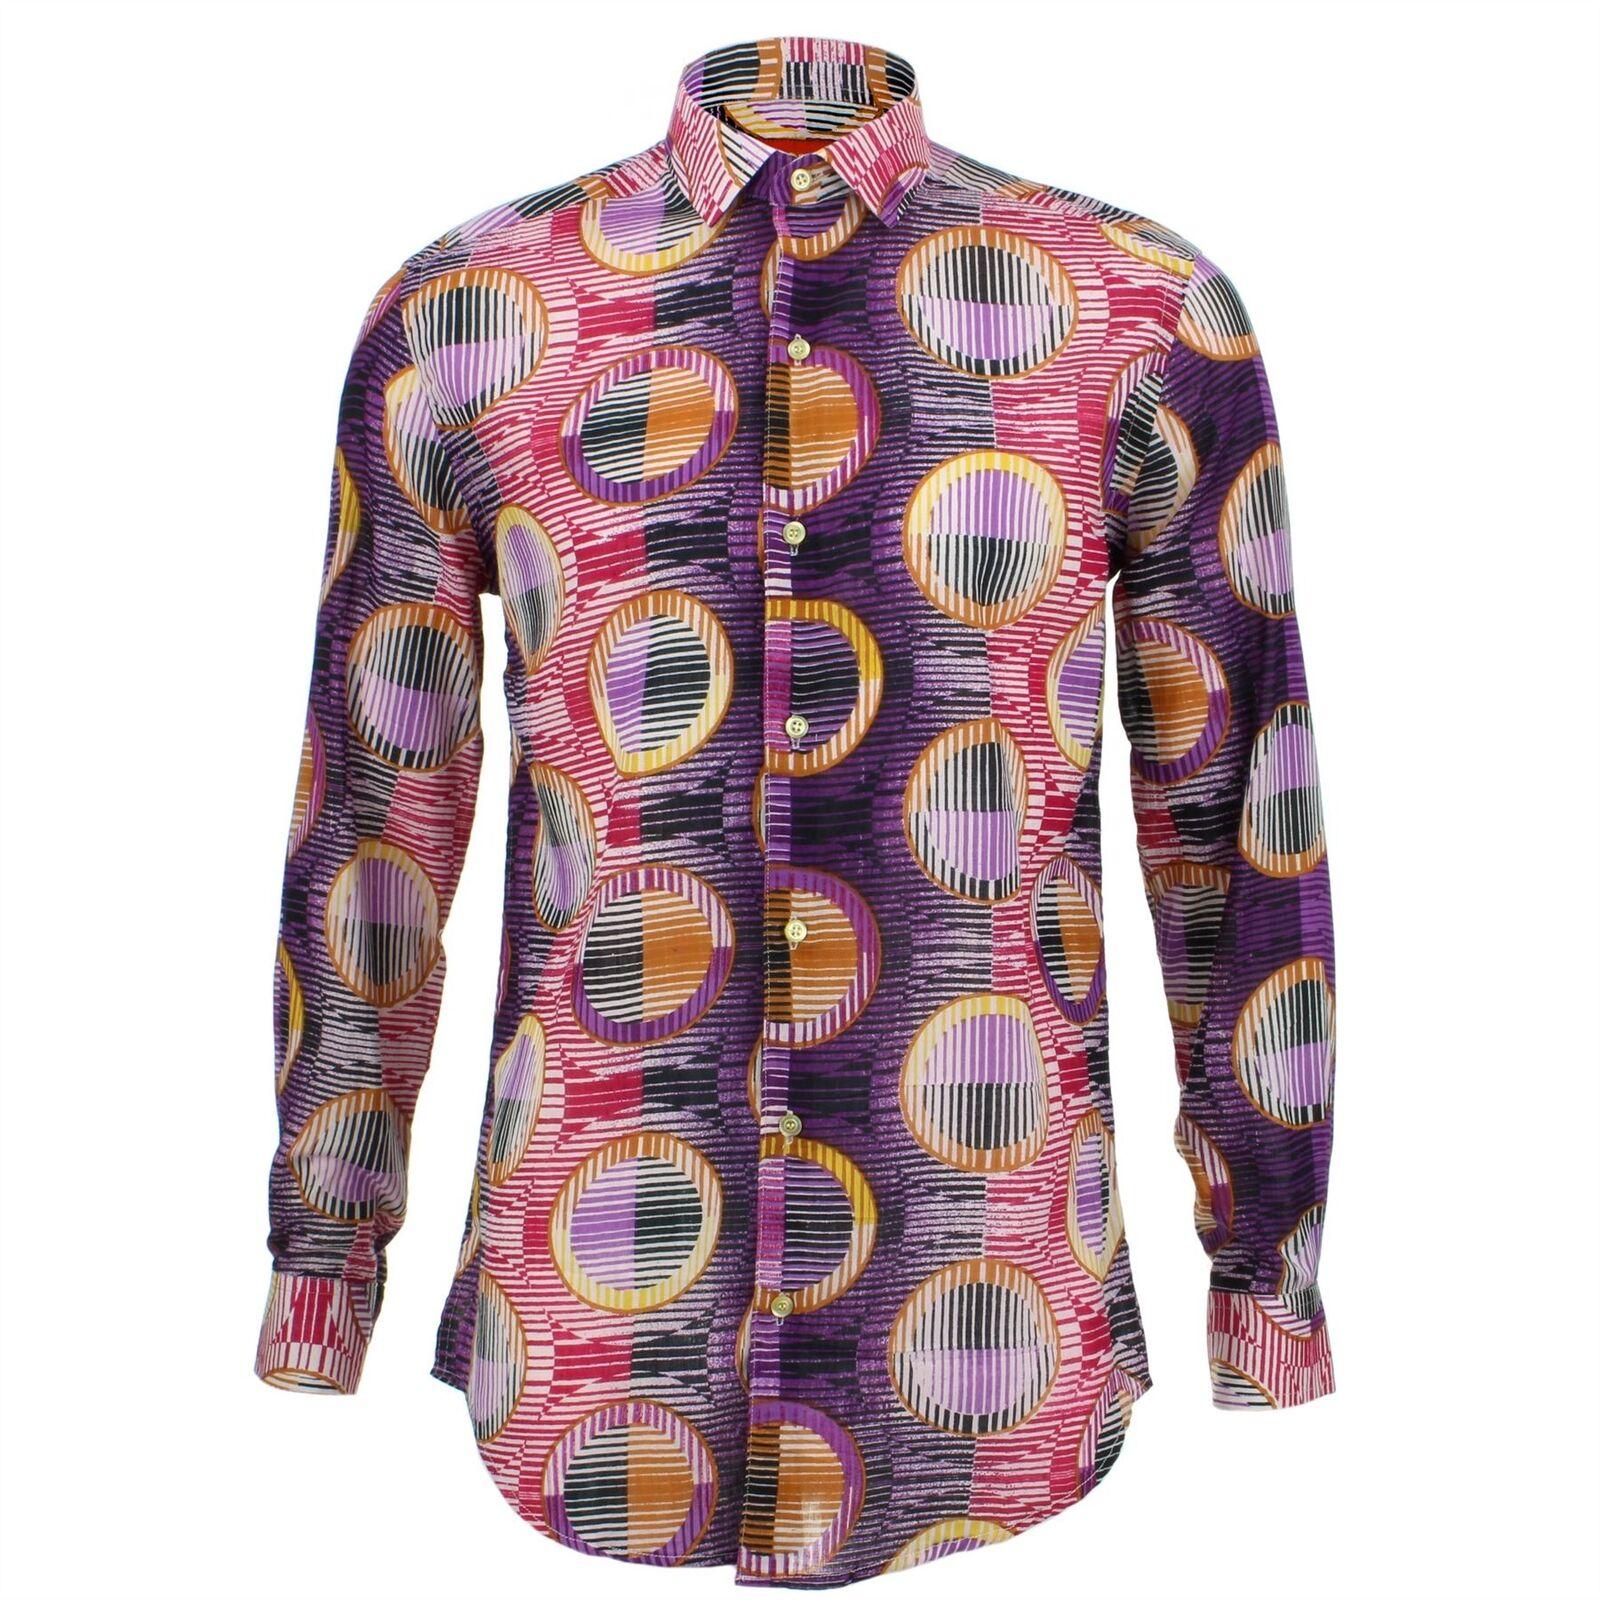 Mens Shirt Loud Originals TAILORED FIT Porthole Purple Retro Psychedelic Fancy